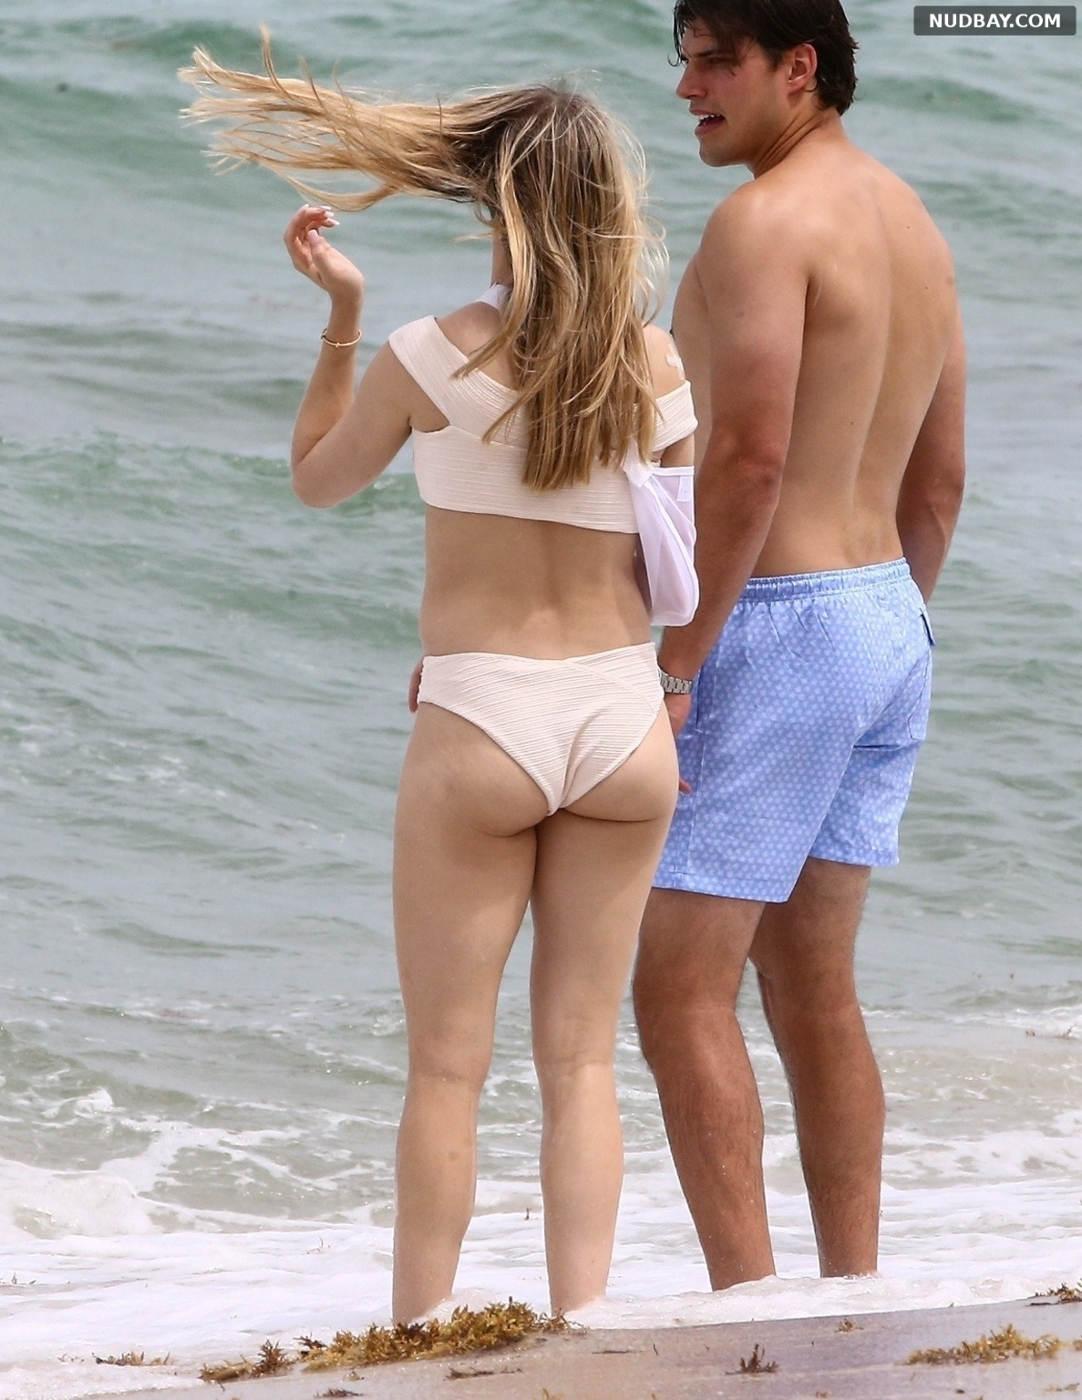 Eugenie Bouchard Booty on the beach in Miami Jun 18 2021